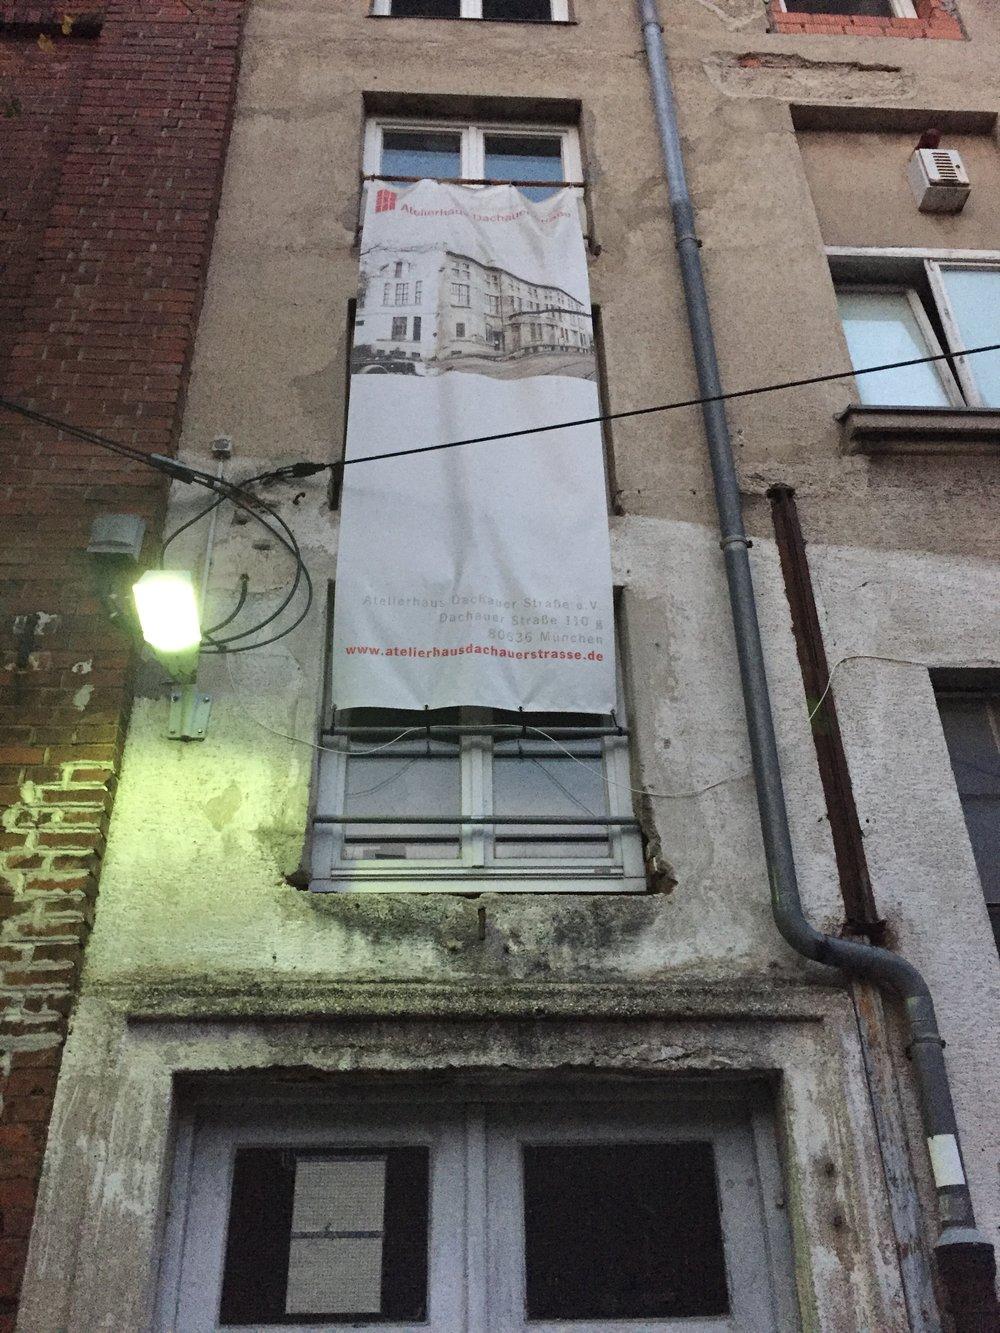 Atelierhaus Dachauer Straße e.V.